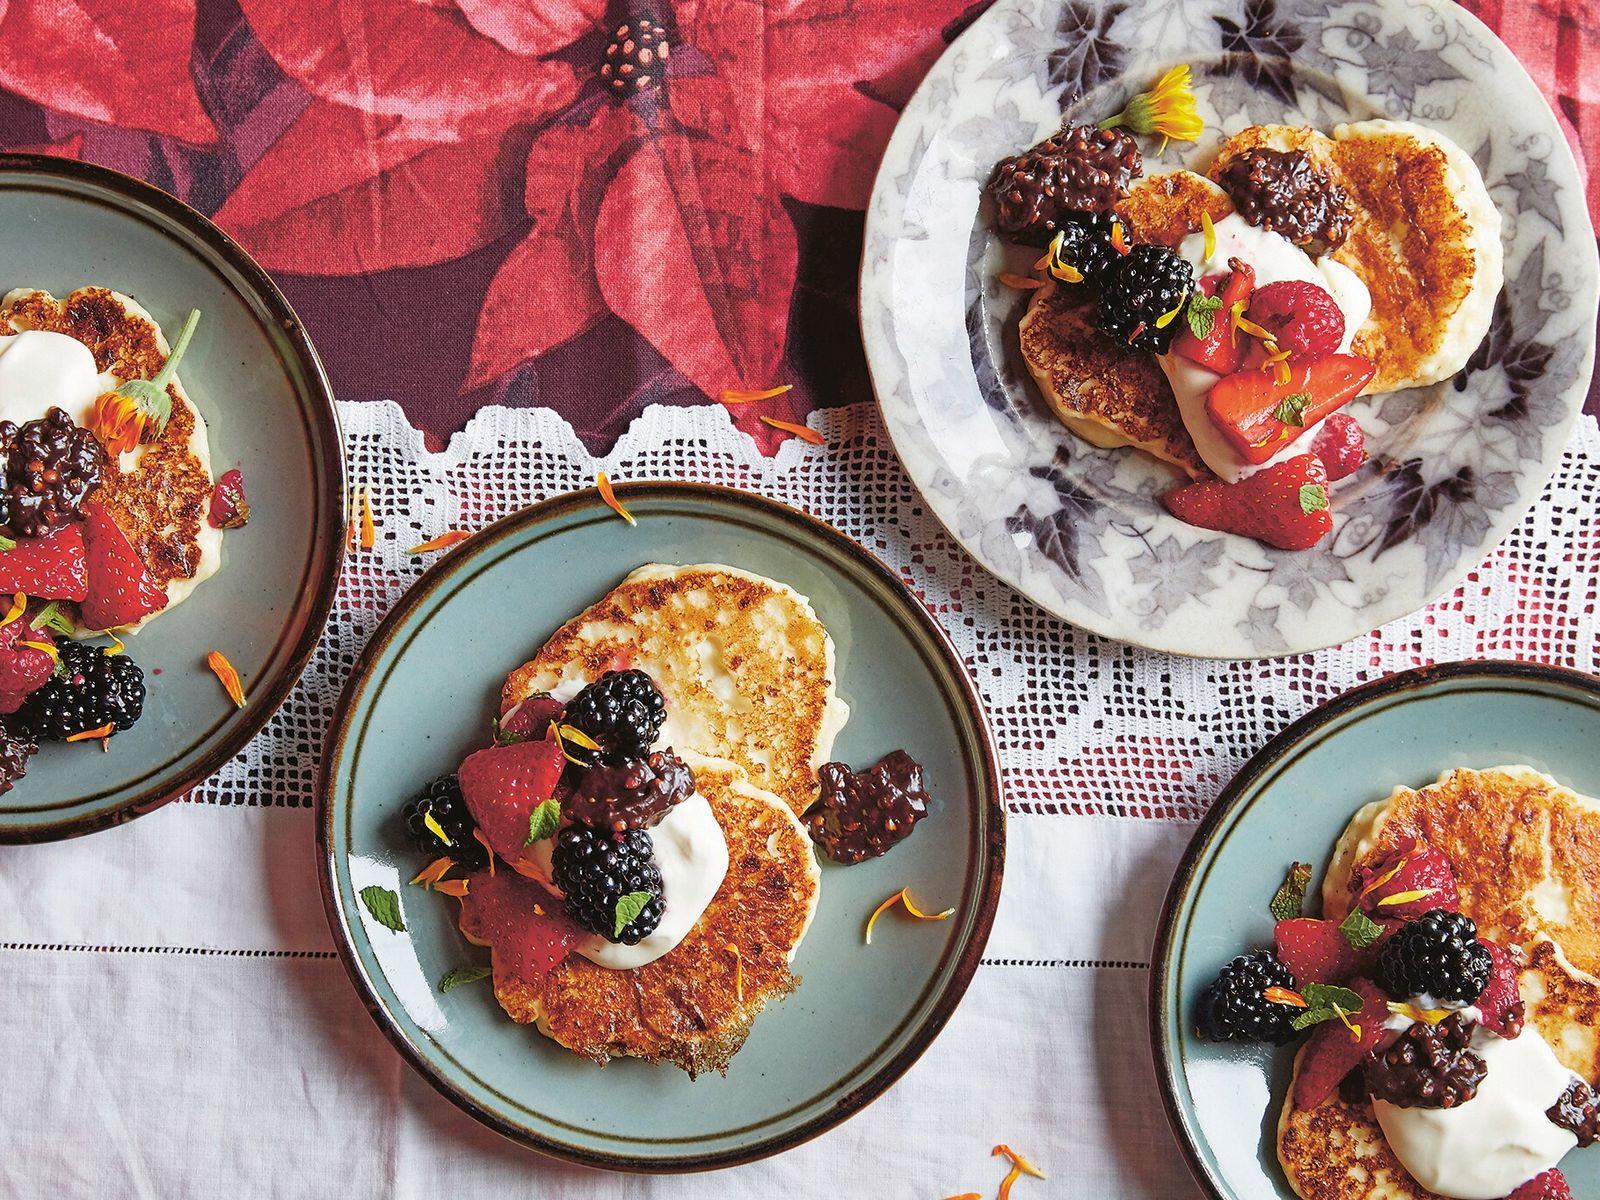 Syrniki pancakes with summer berry salad and chocolate buckwheat.